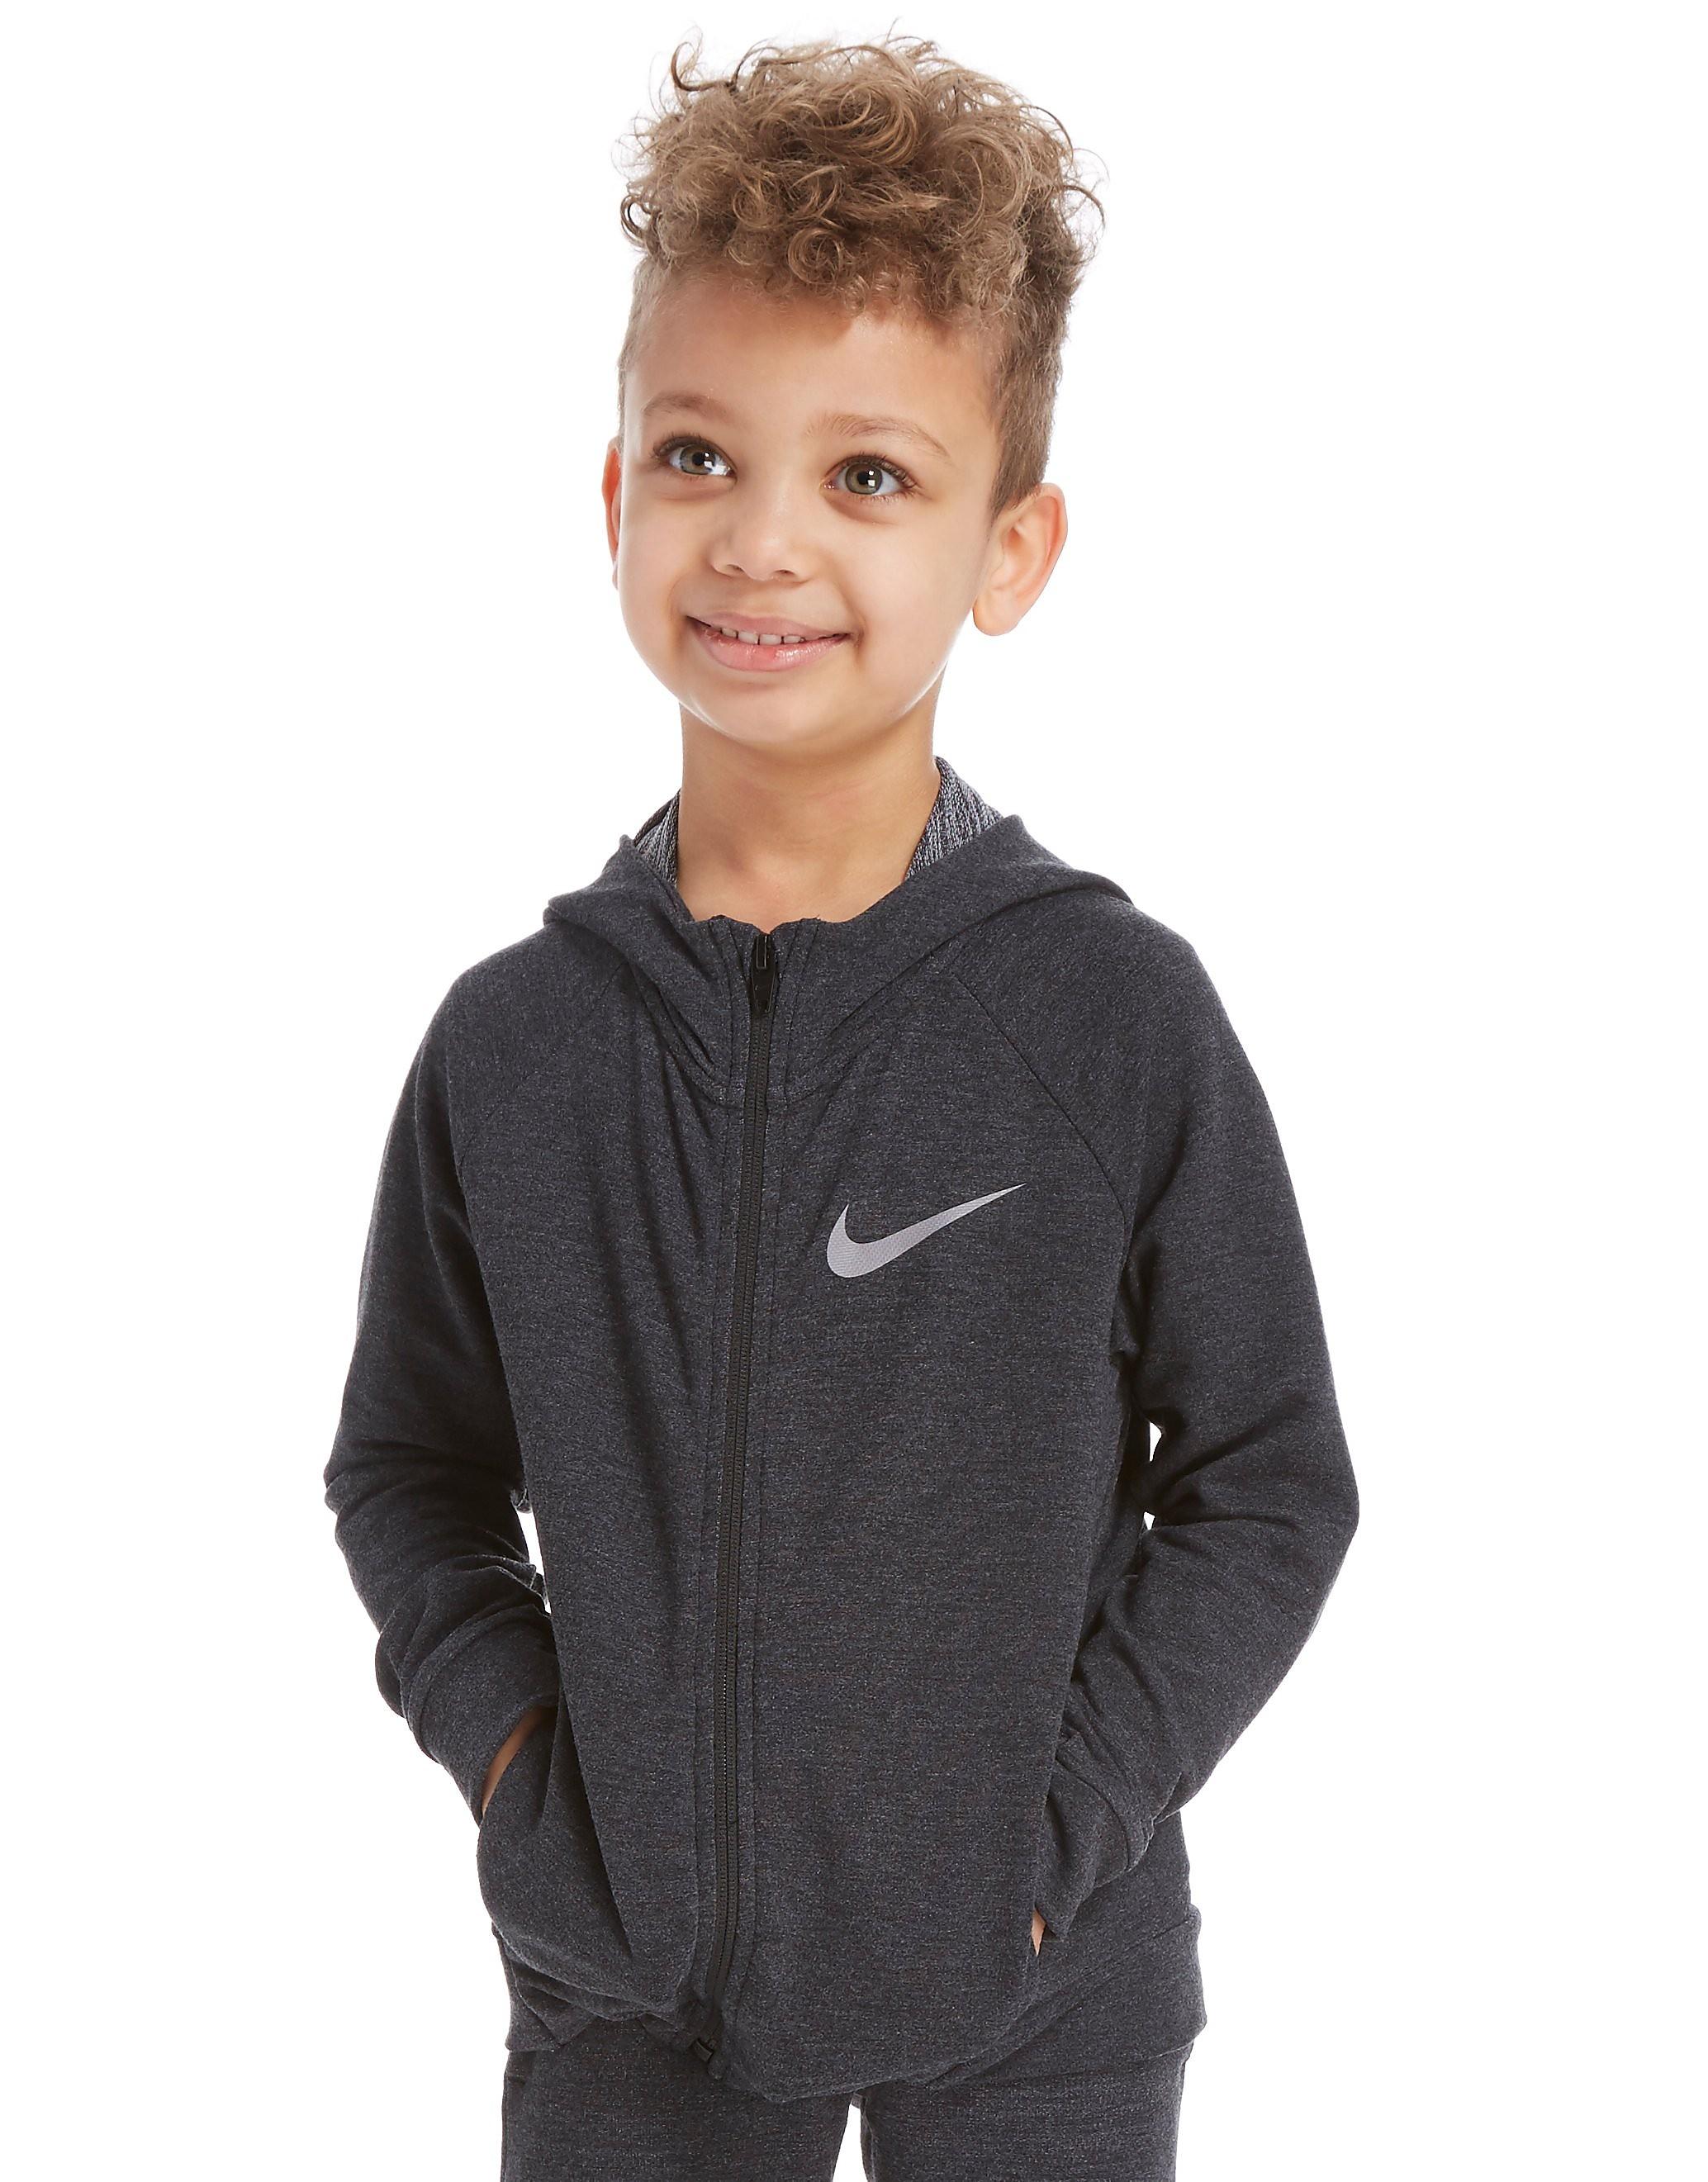 Nike Dri-FIT Full Zip Hoodie Children